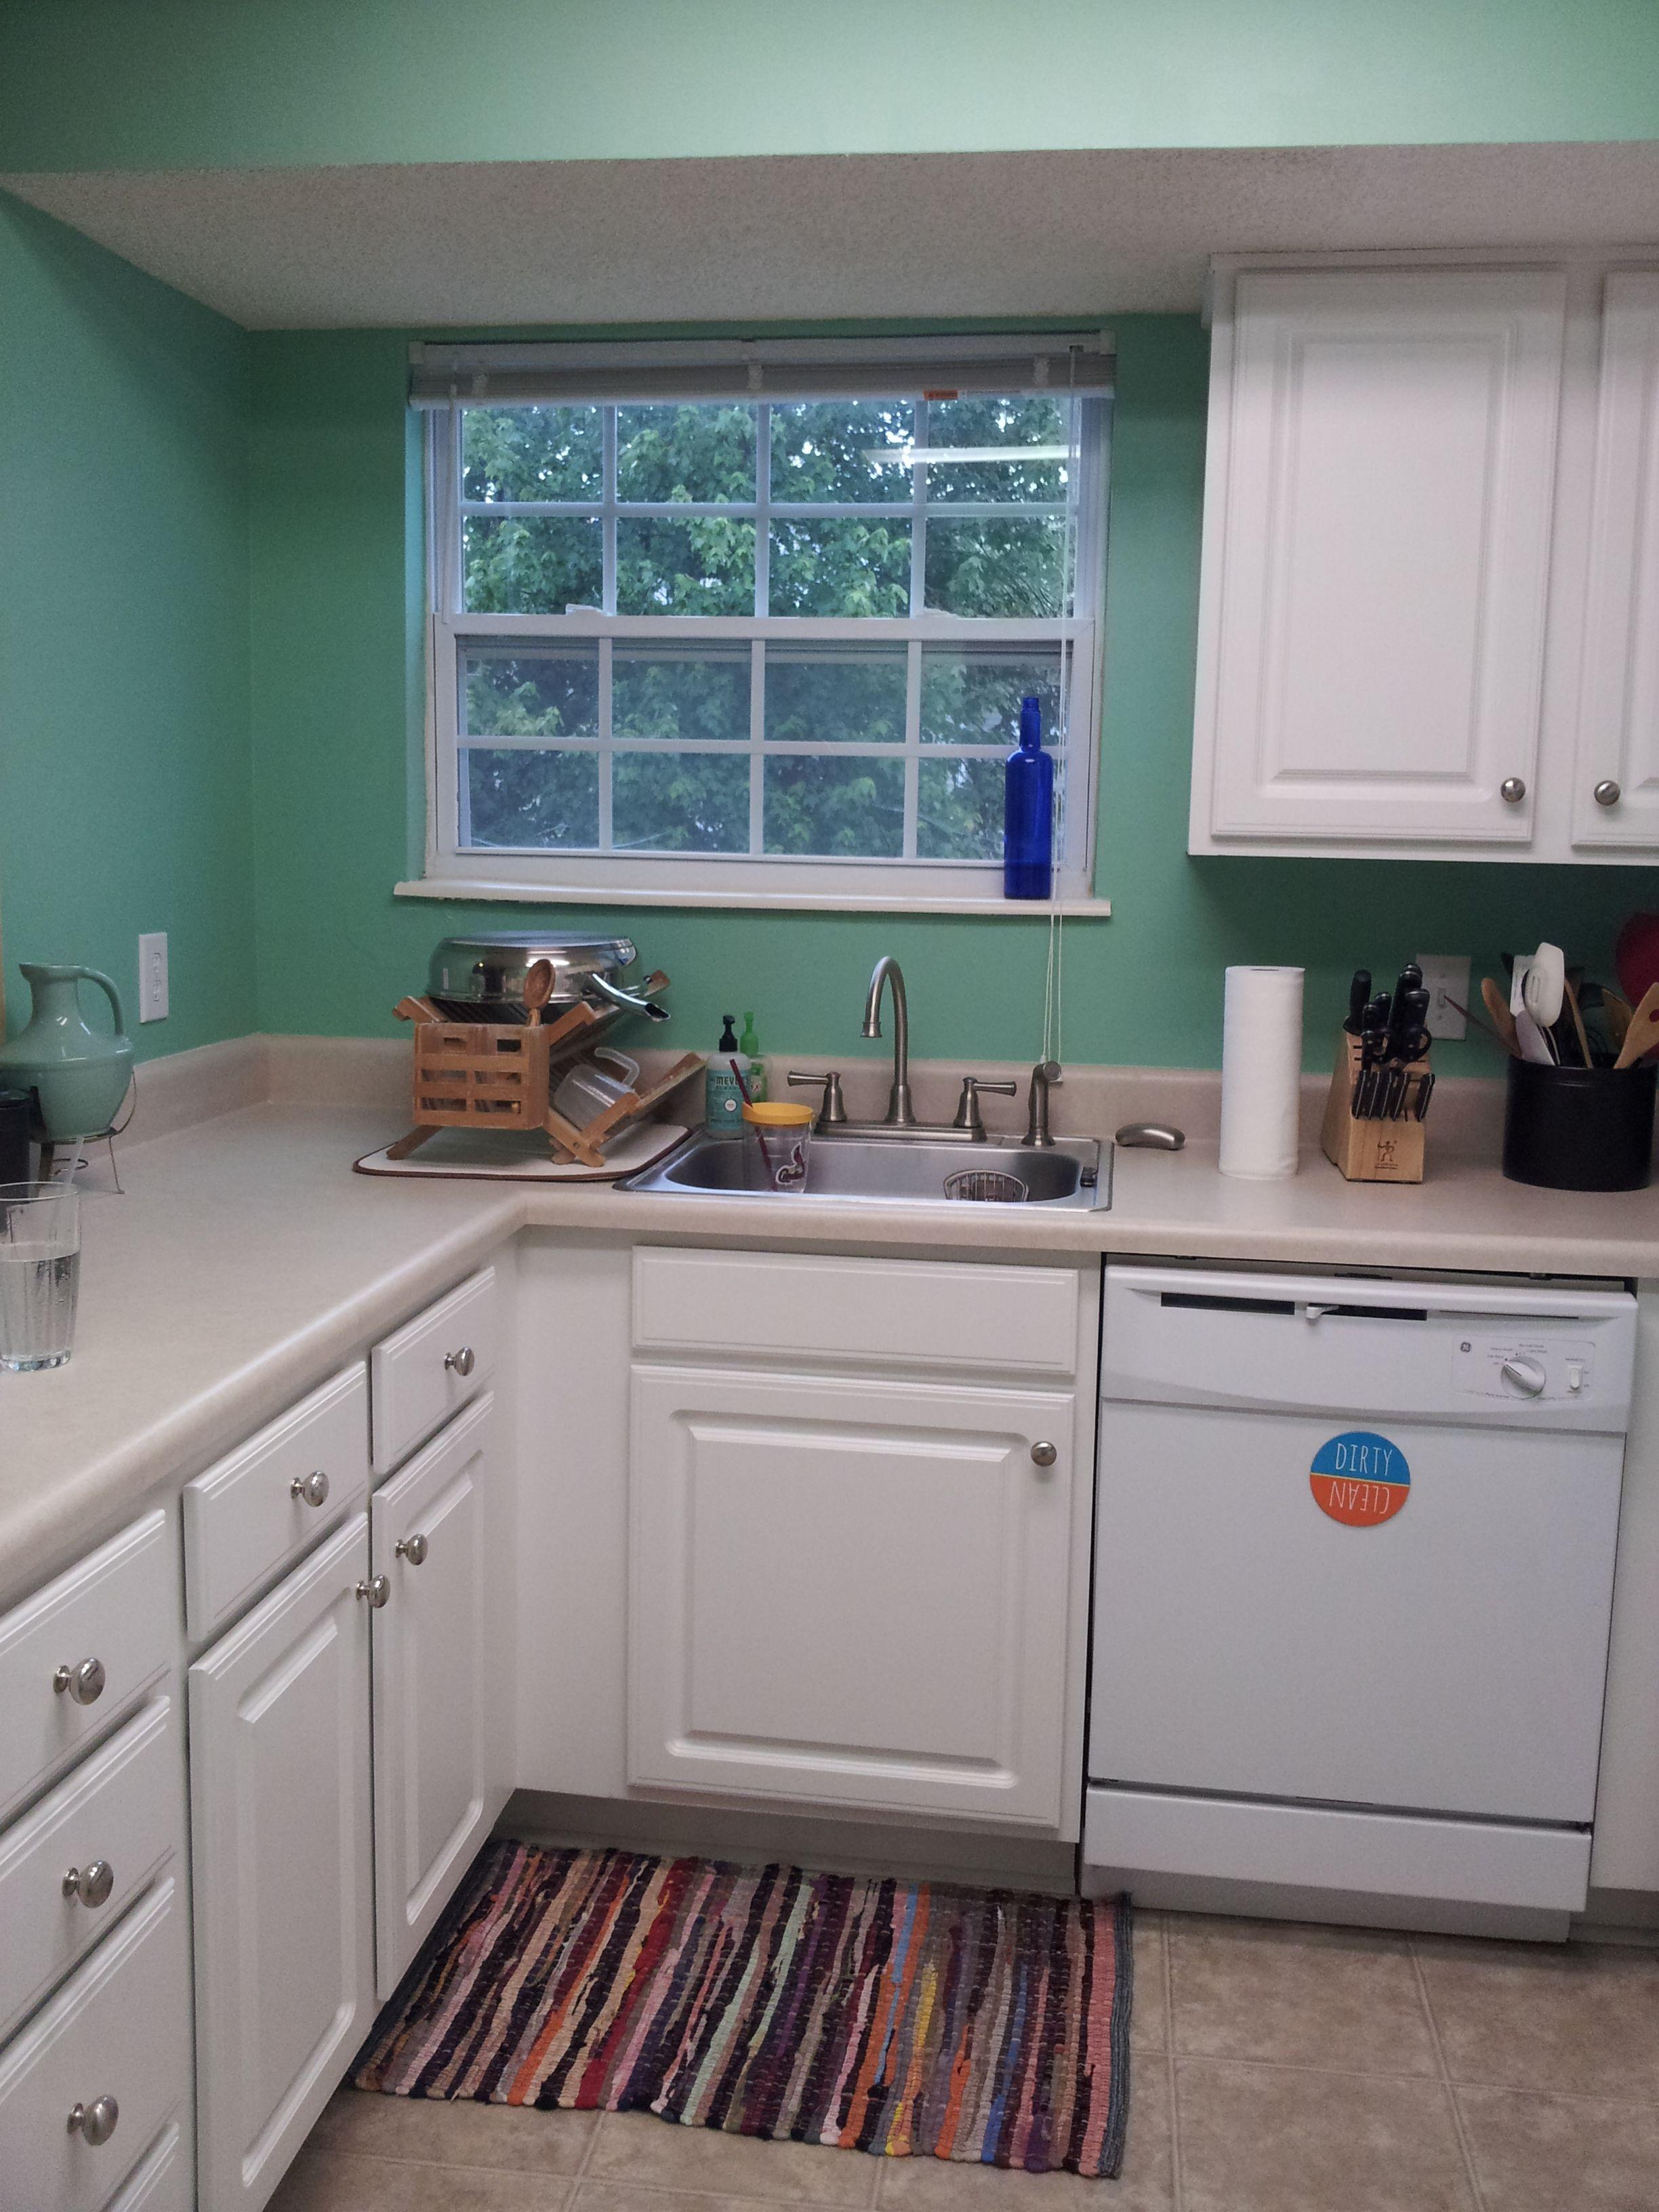 Best Kitchen Gallery: Valspar Kelp Home Pinterest White Cabi Kitchen Paint Ideas of Valspar Kitchen Colors on rachelxblog.com